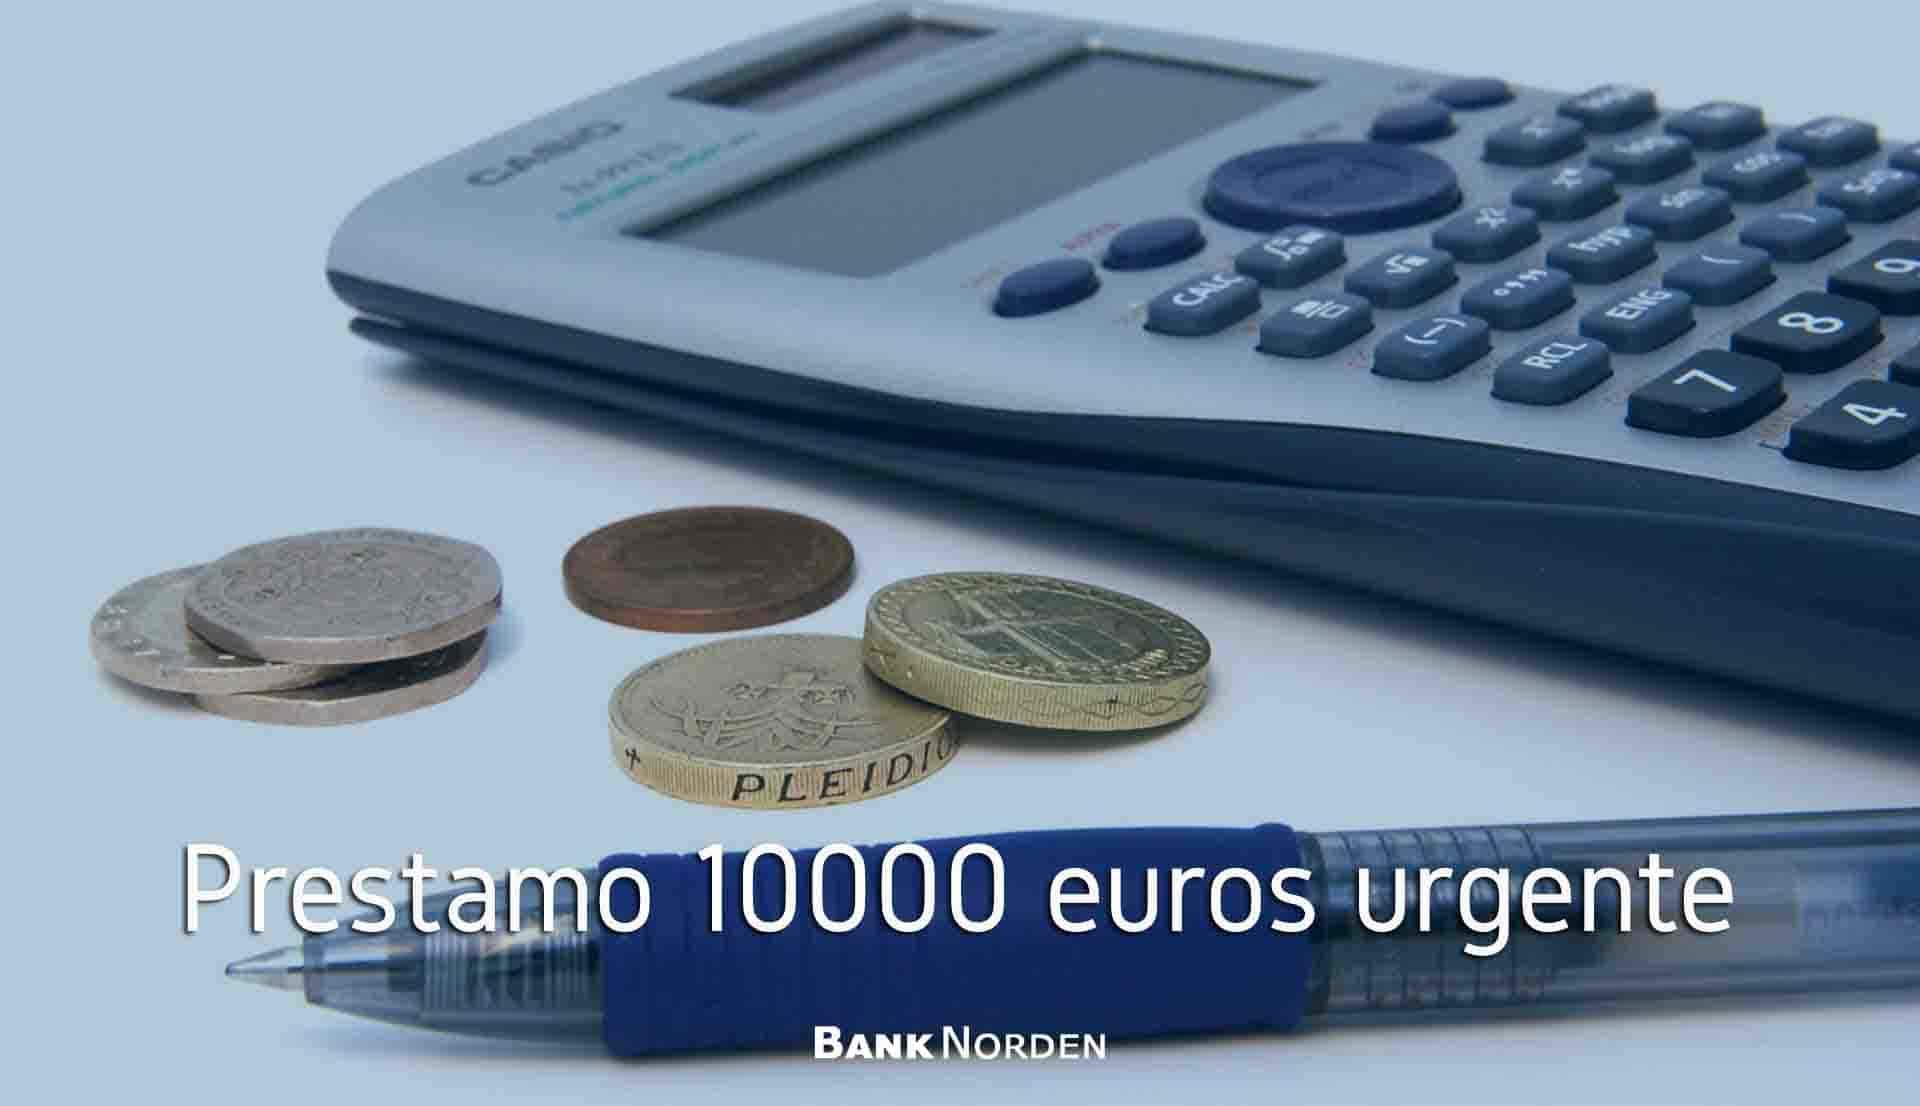 Prestamo 10000 euros urgente